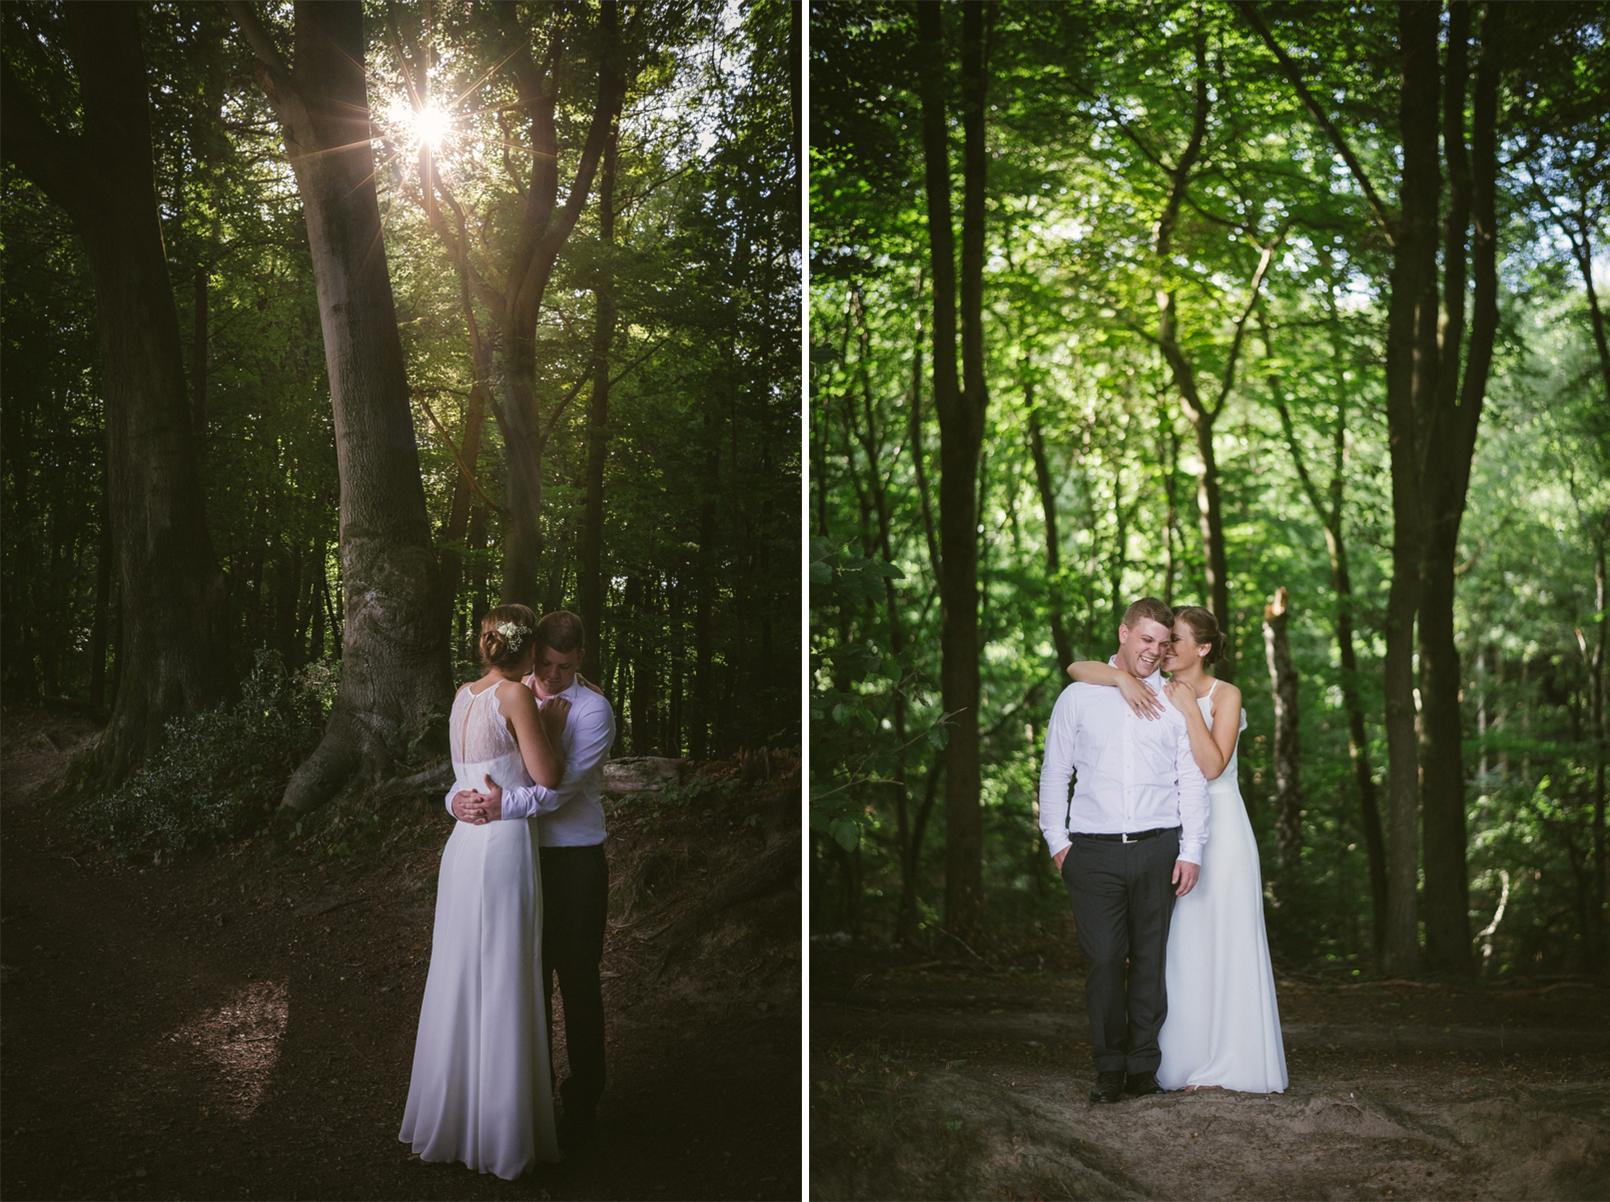 Hochzeitsfotograf-Fotografie-Aachen-Lua-Pauline-Dreamcatcher-0067